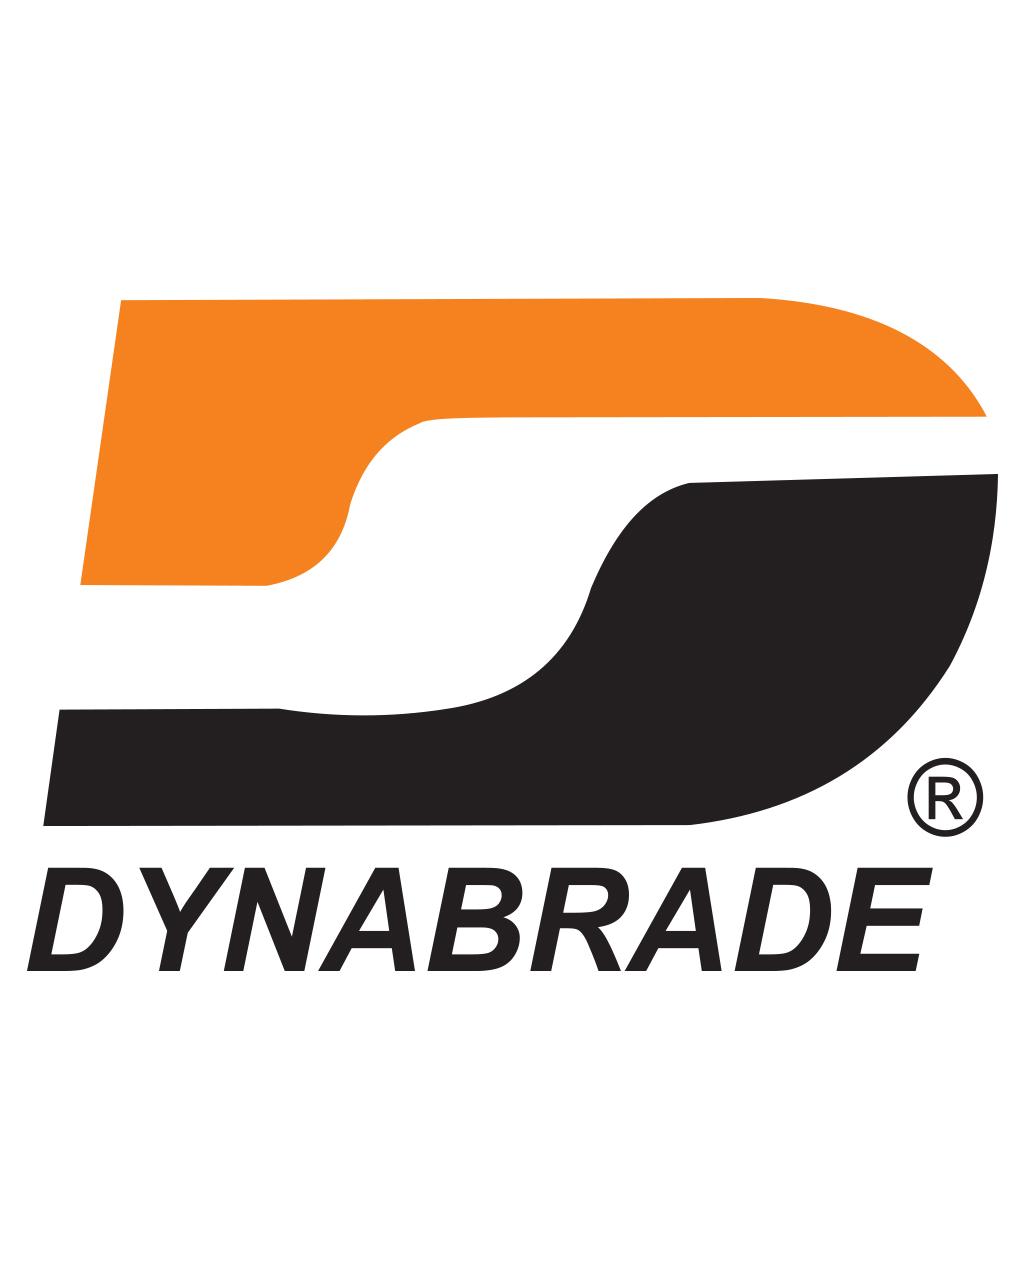 DYNABRADE USA